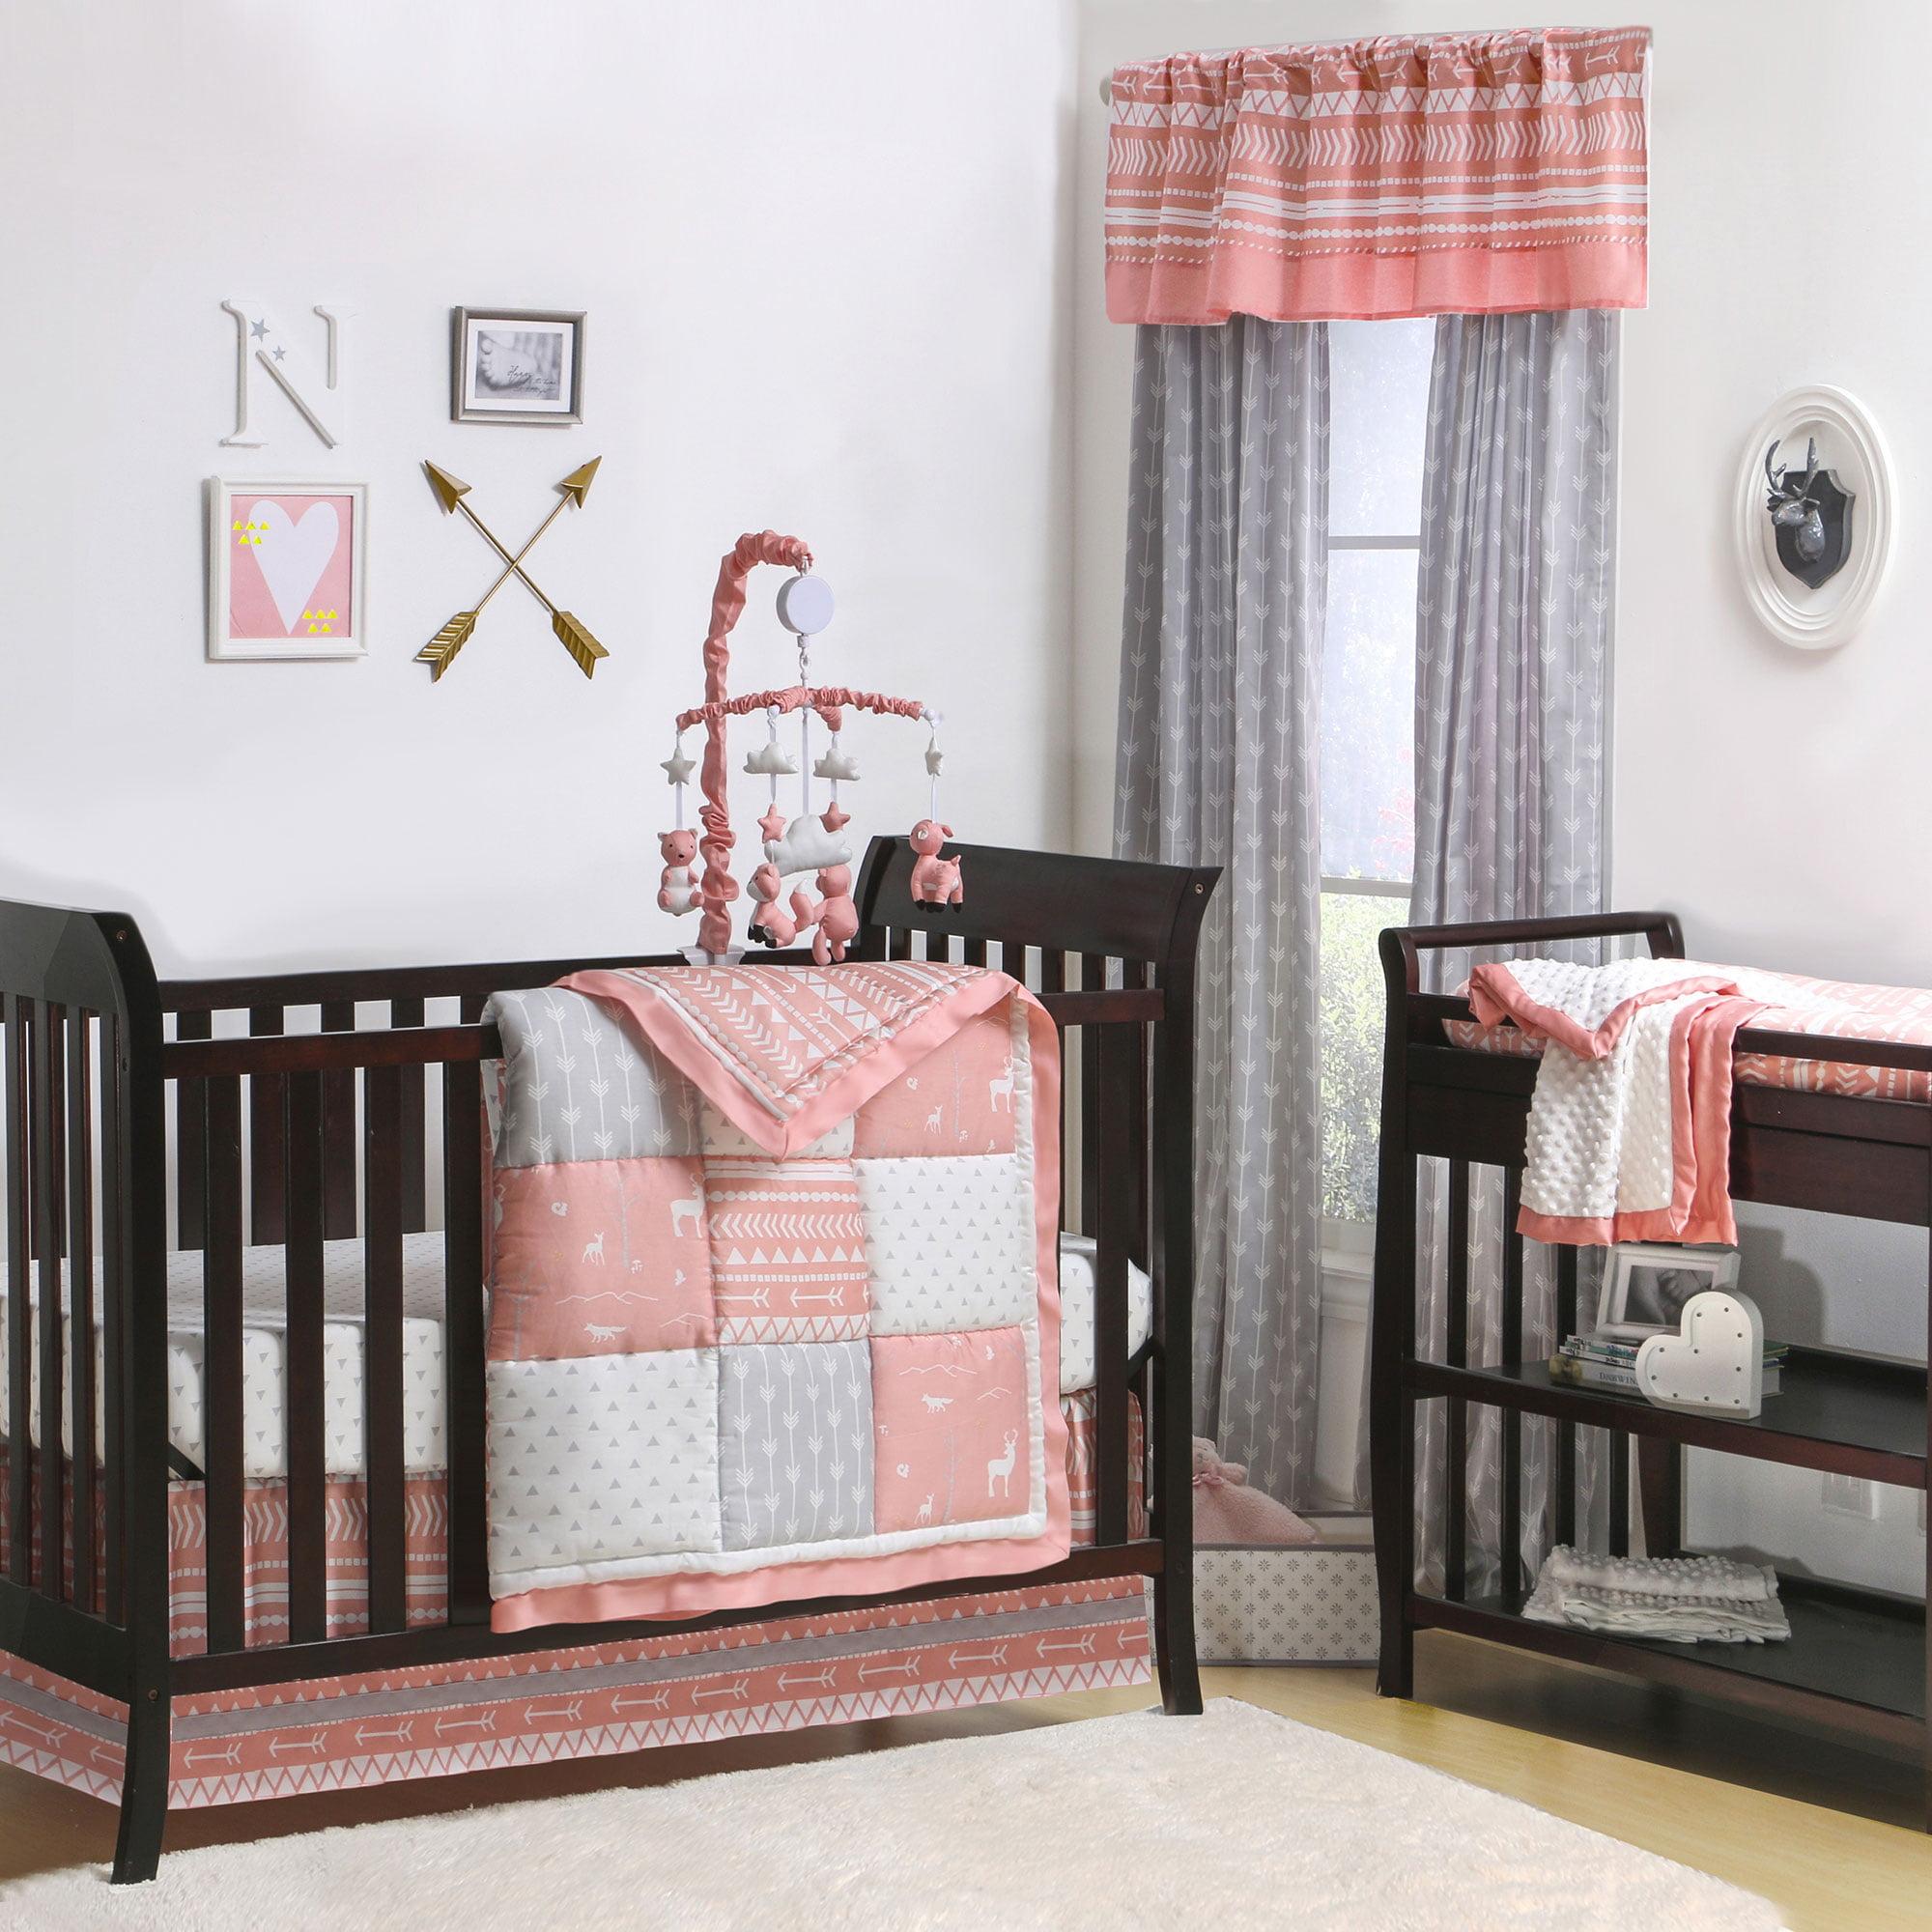 Peanut Shell 4 Piece Baby Crib Bedding Set - Coral Pink W...